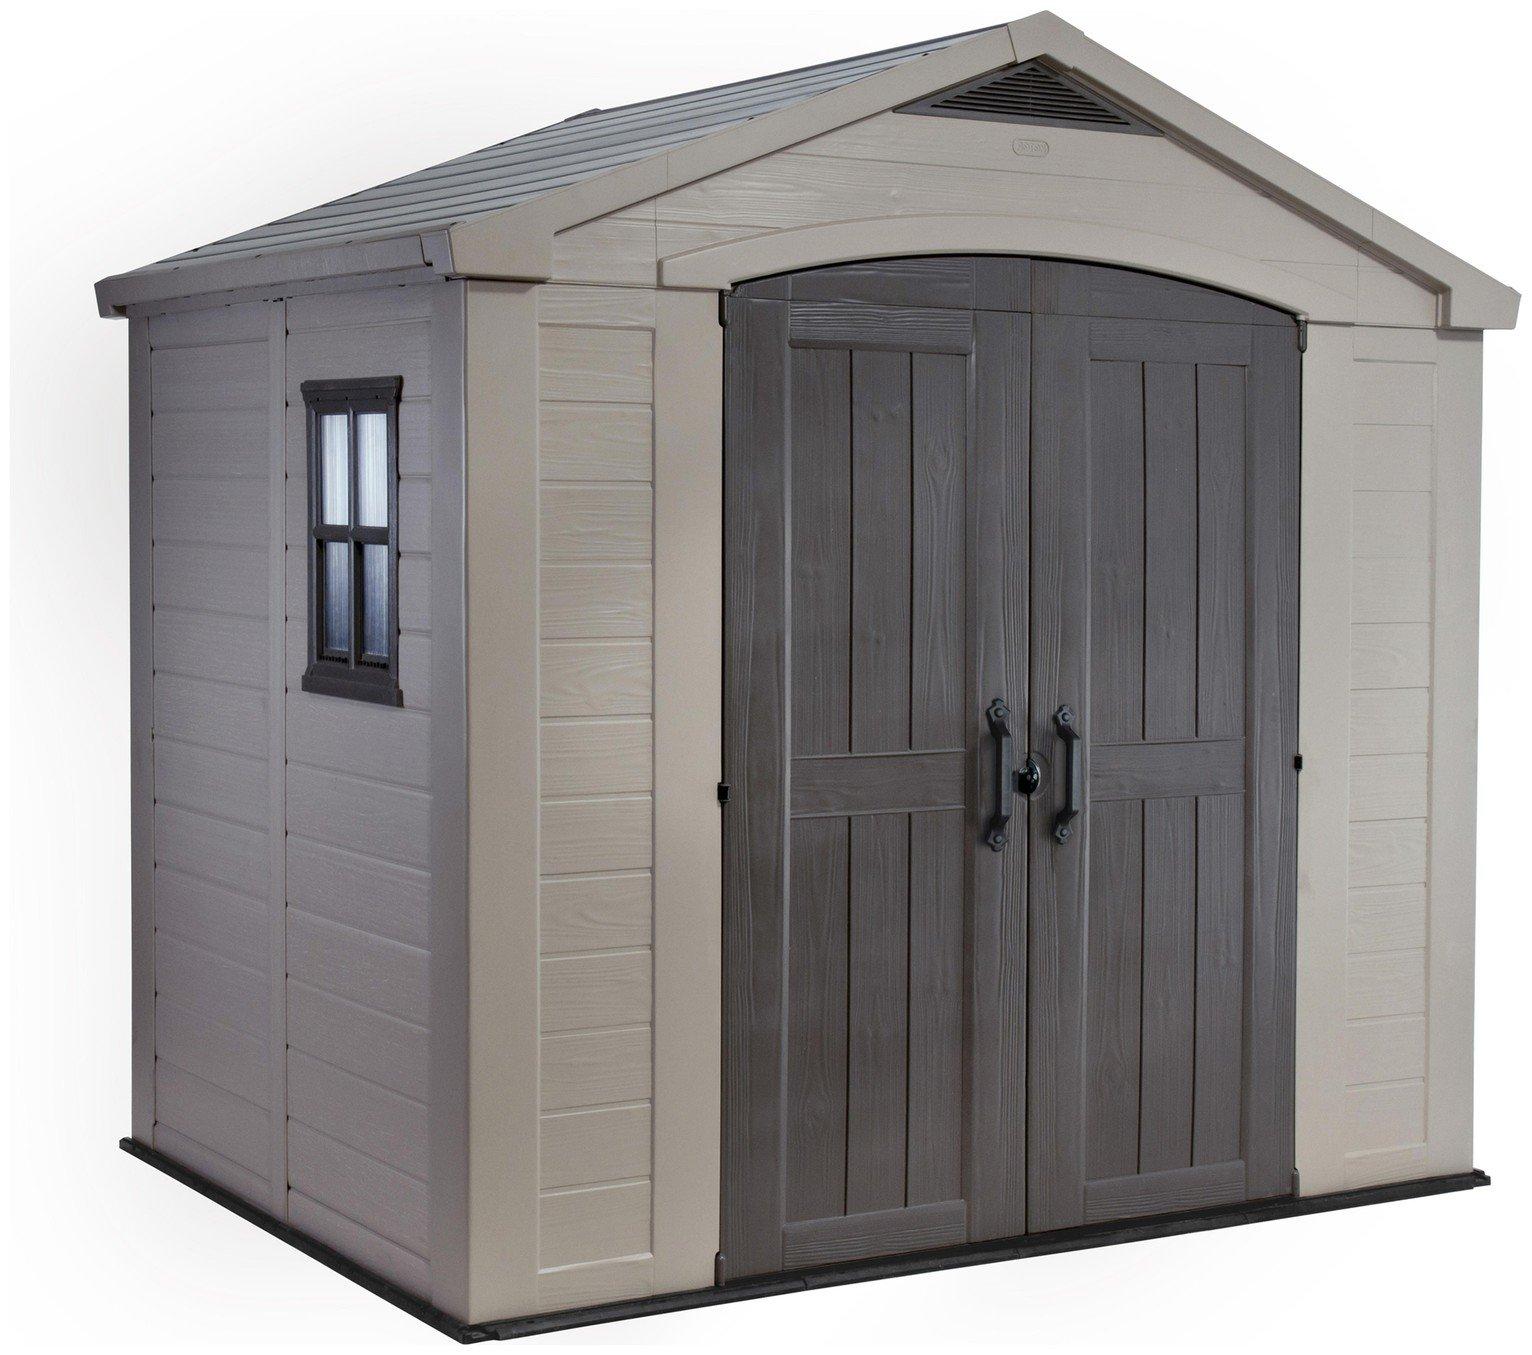 Garden Sheds Argos buy keter apex plastic beige & brown garden shed - 8 x 6ft at